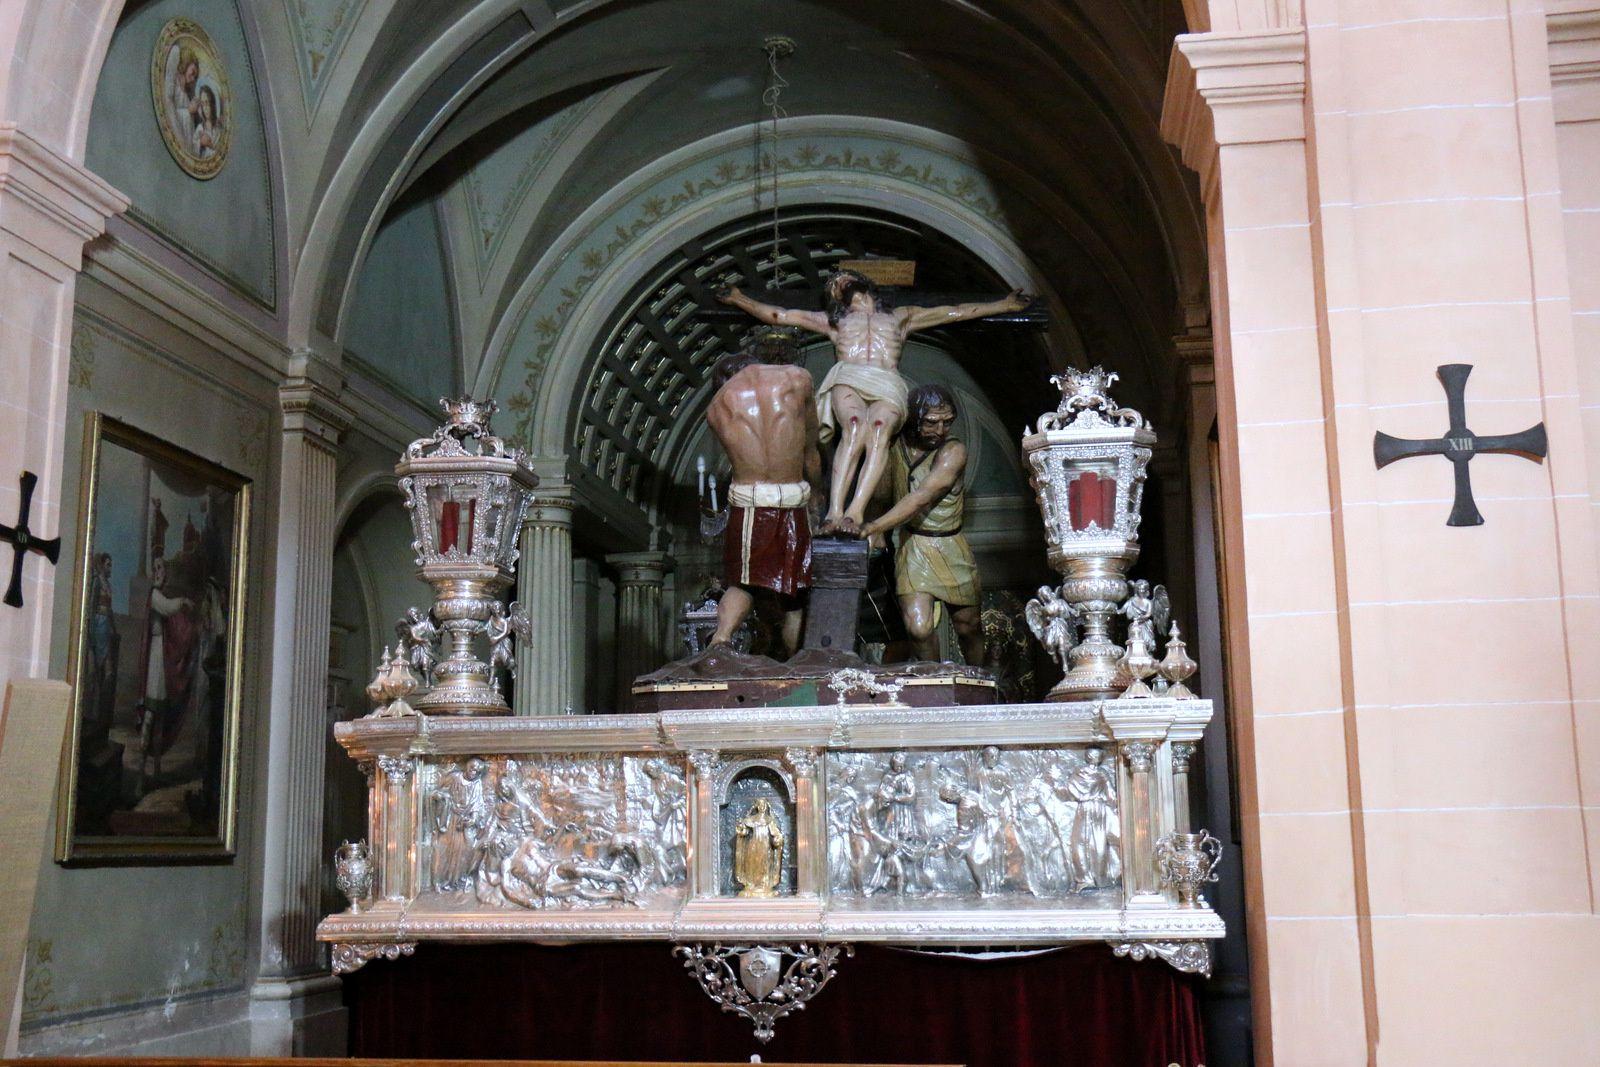 Eglise du monastère Santa Clara de Palma de Majorque